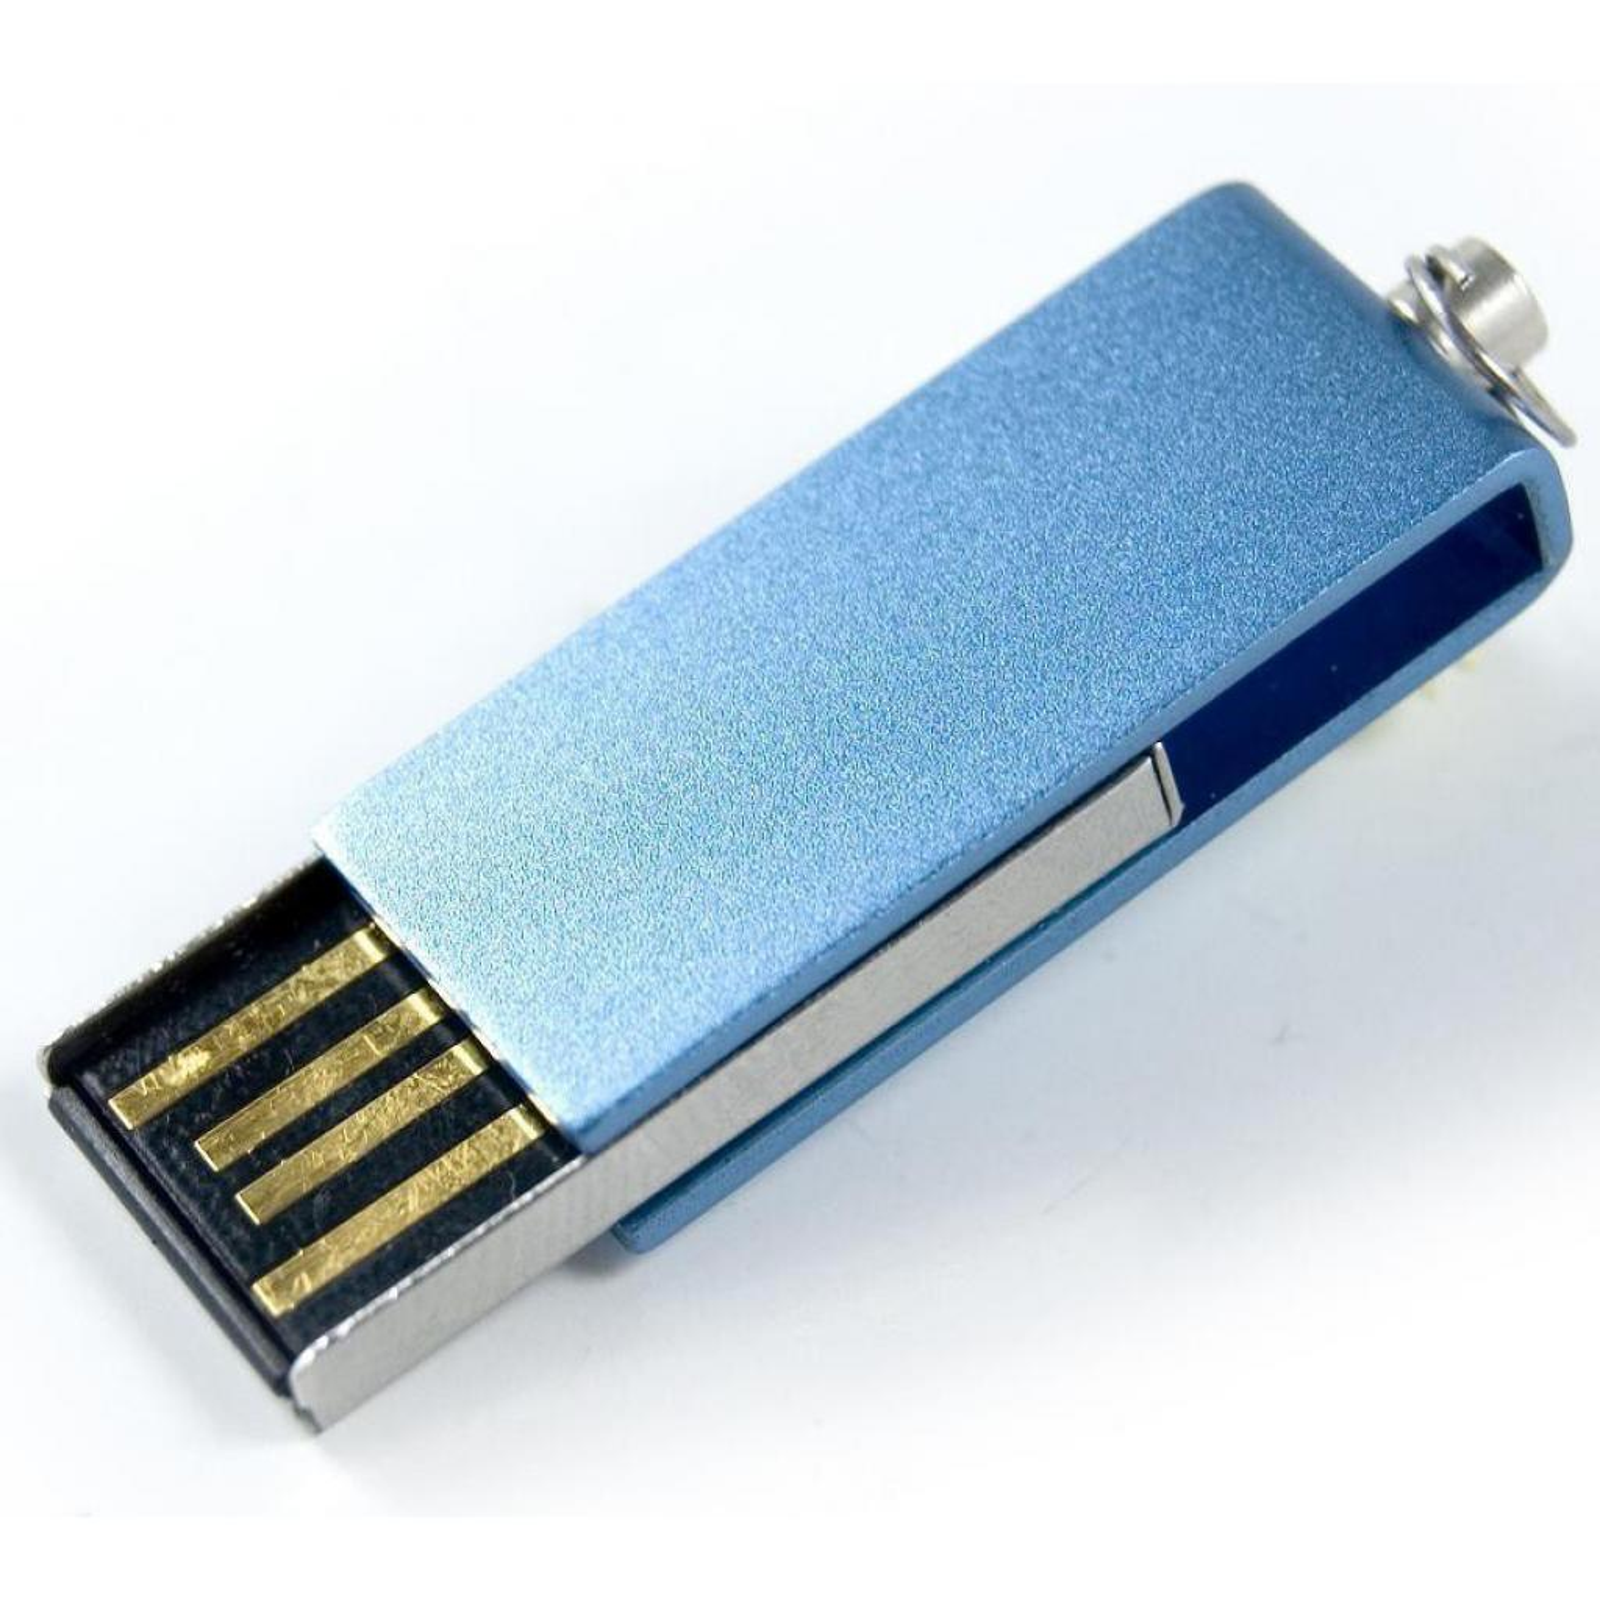 USB флеш накопитель Goodram 64GB UCU2 Cube Black USB 2.0 (UCU2-0640K0R11) изображение 3